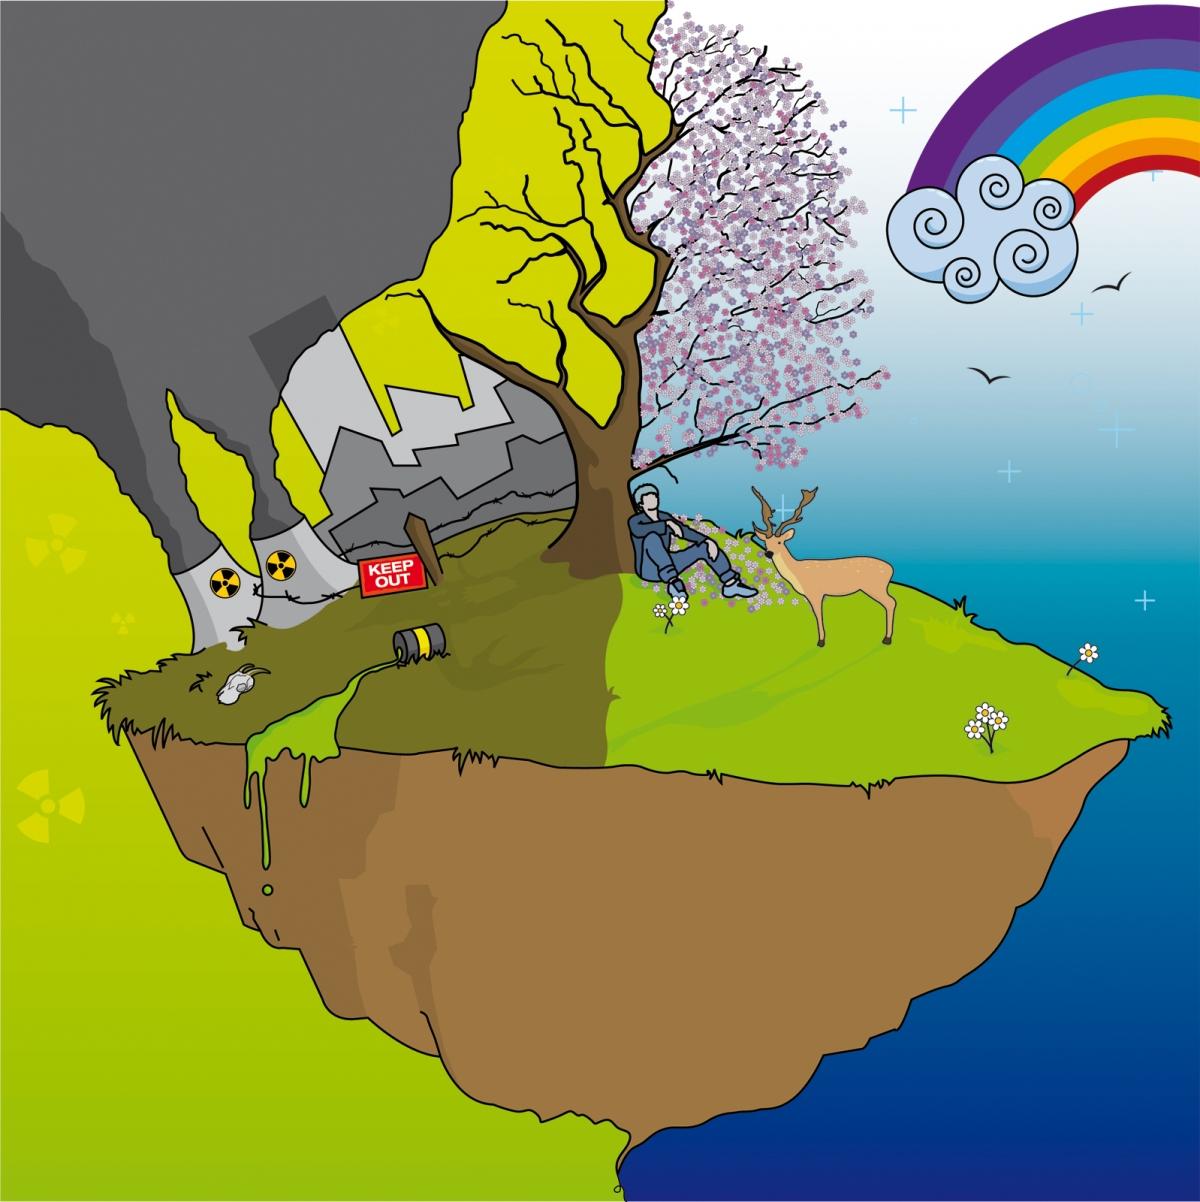 New epoch - the Anthropocene